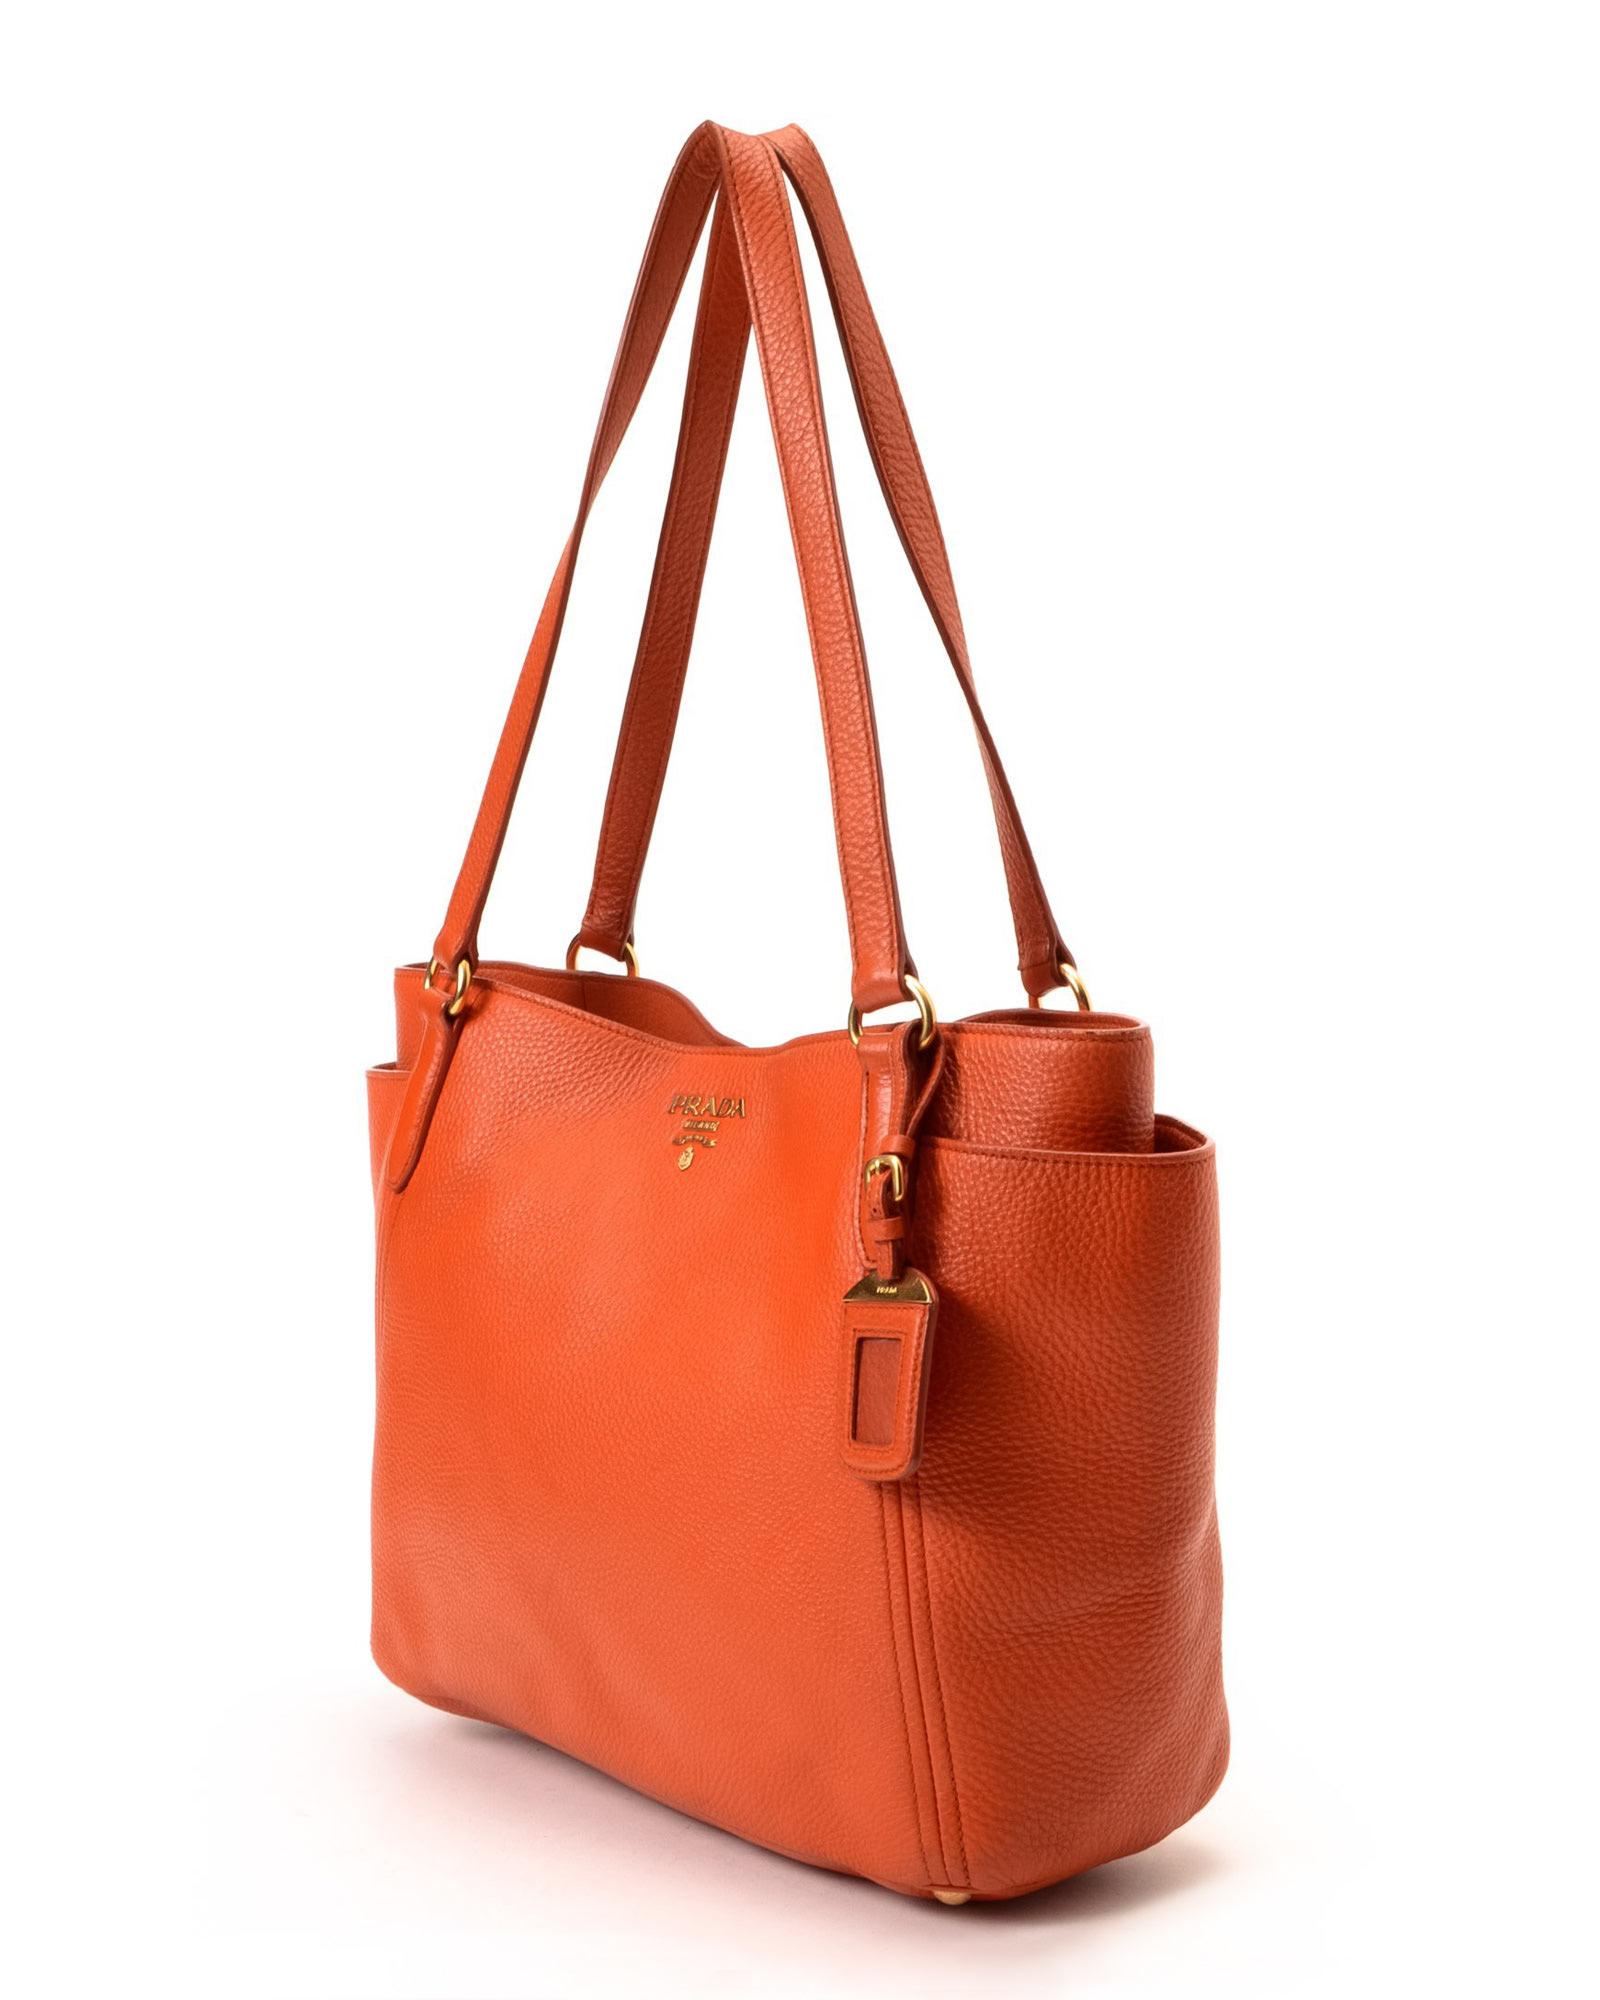 prada blue leather handbag - Prada tote black+orange